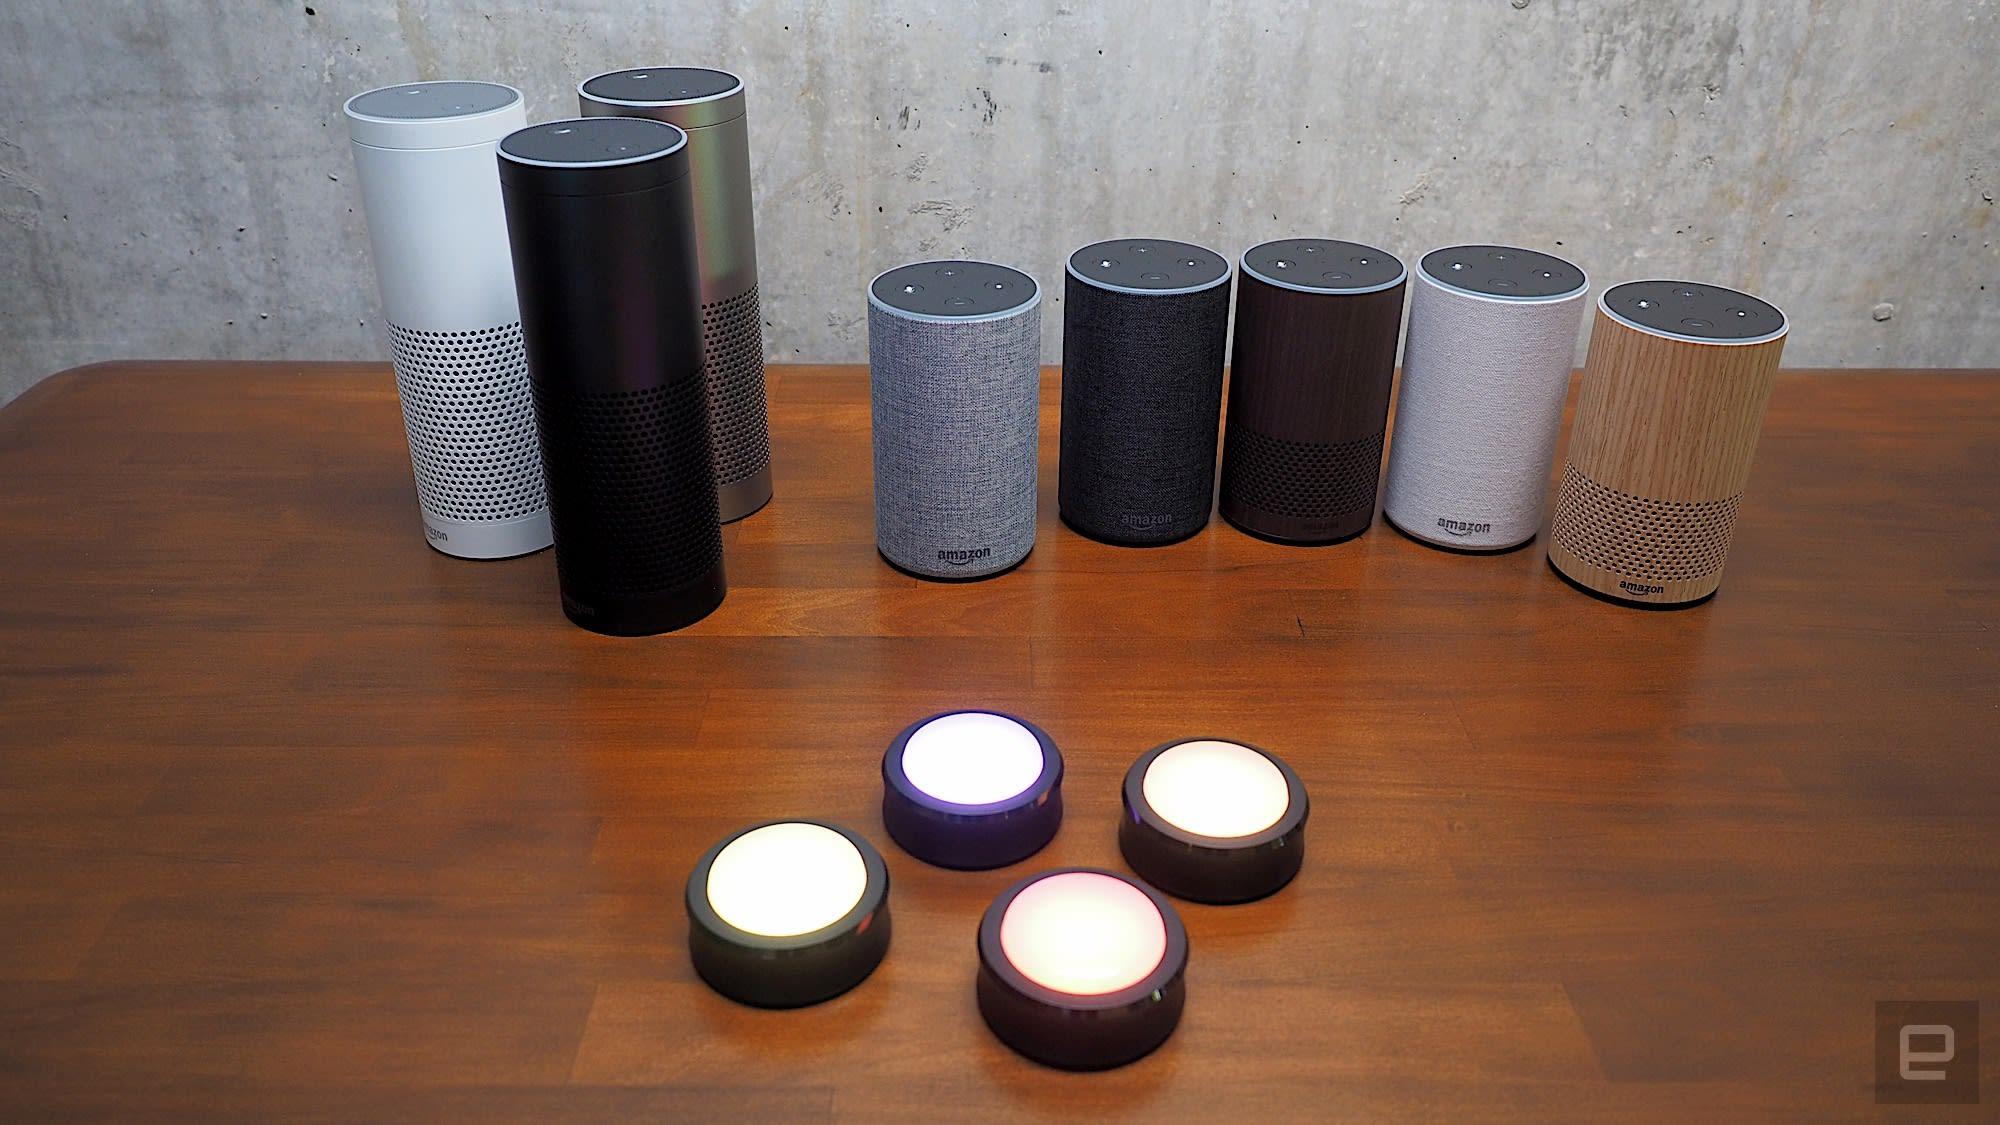 Amazon's Alexa and Prime Music service arrive in Canada